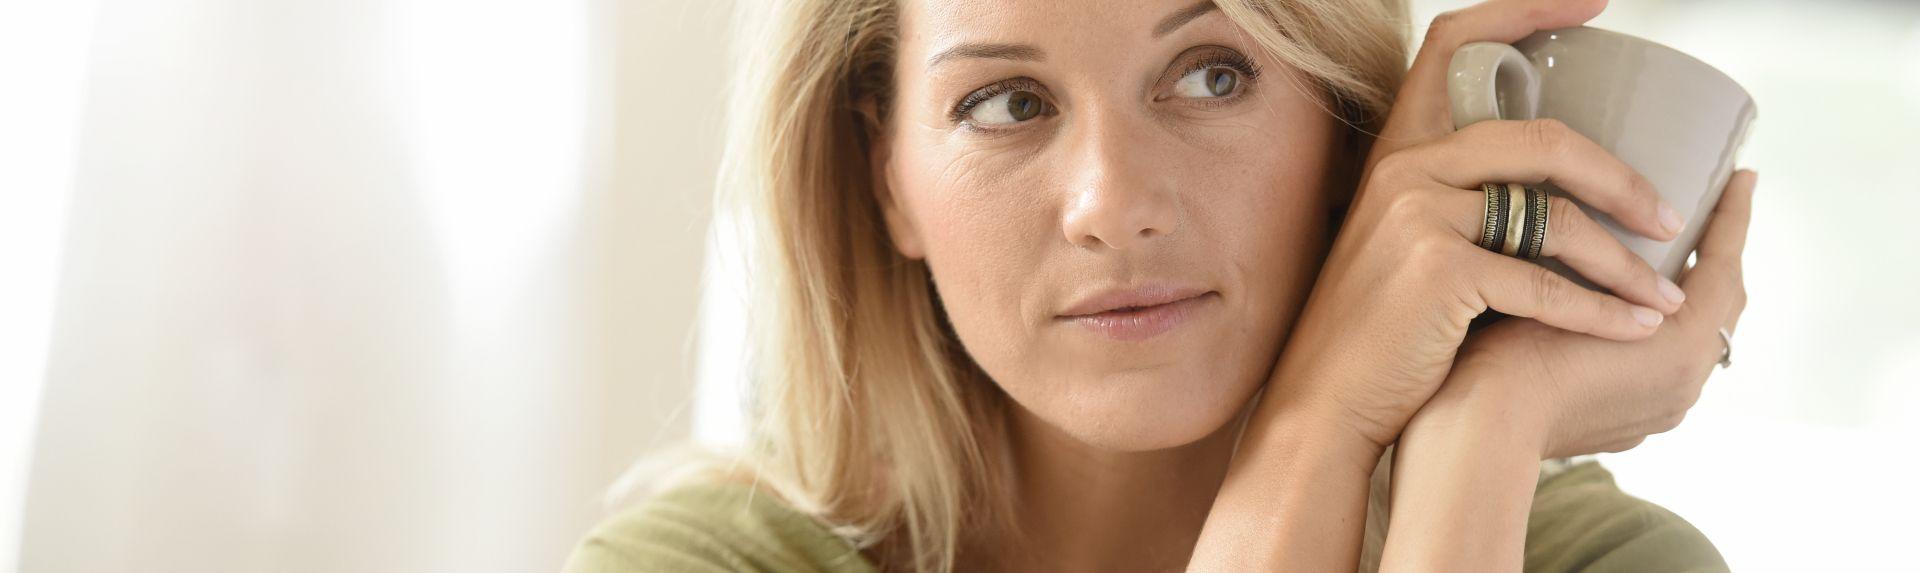 Менопауза и биполярное расстройство